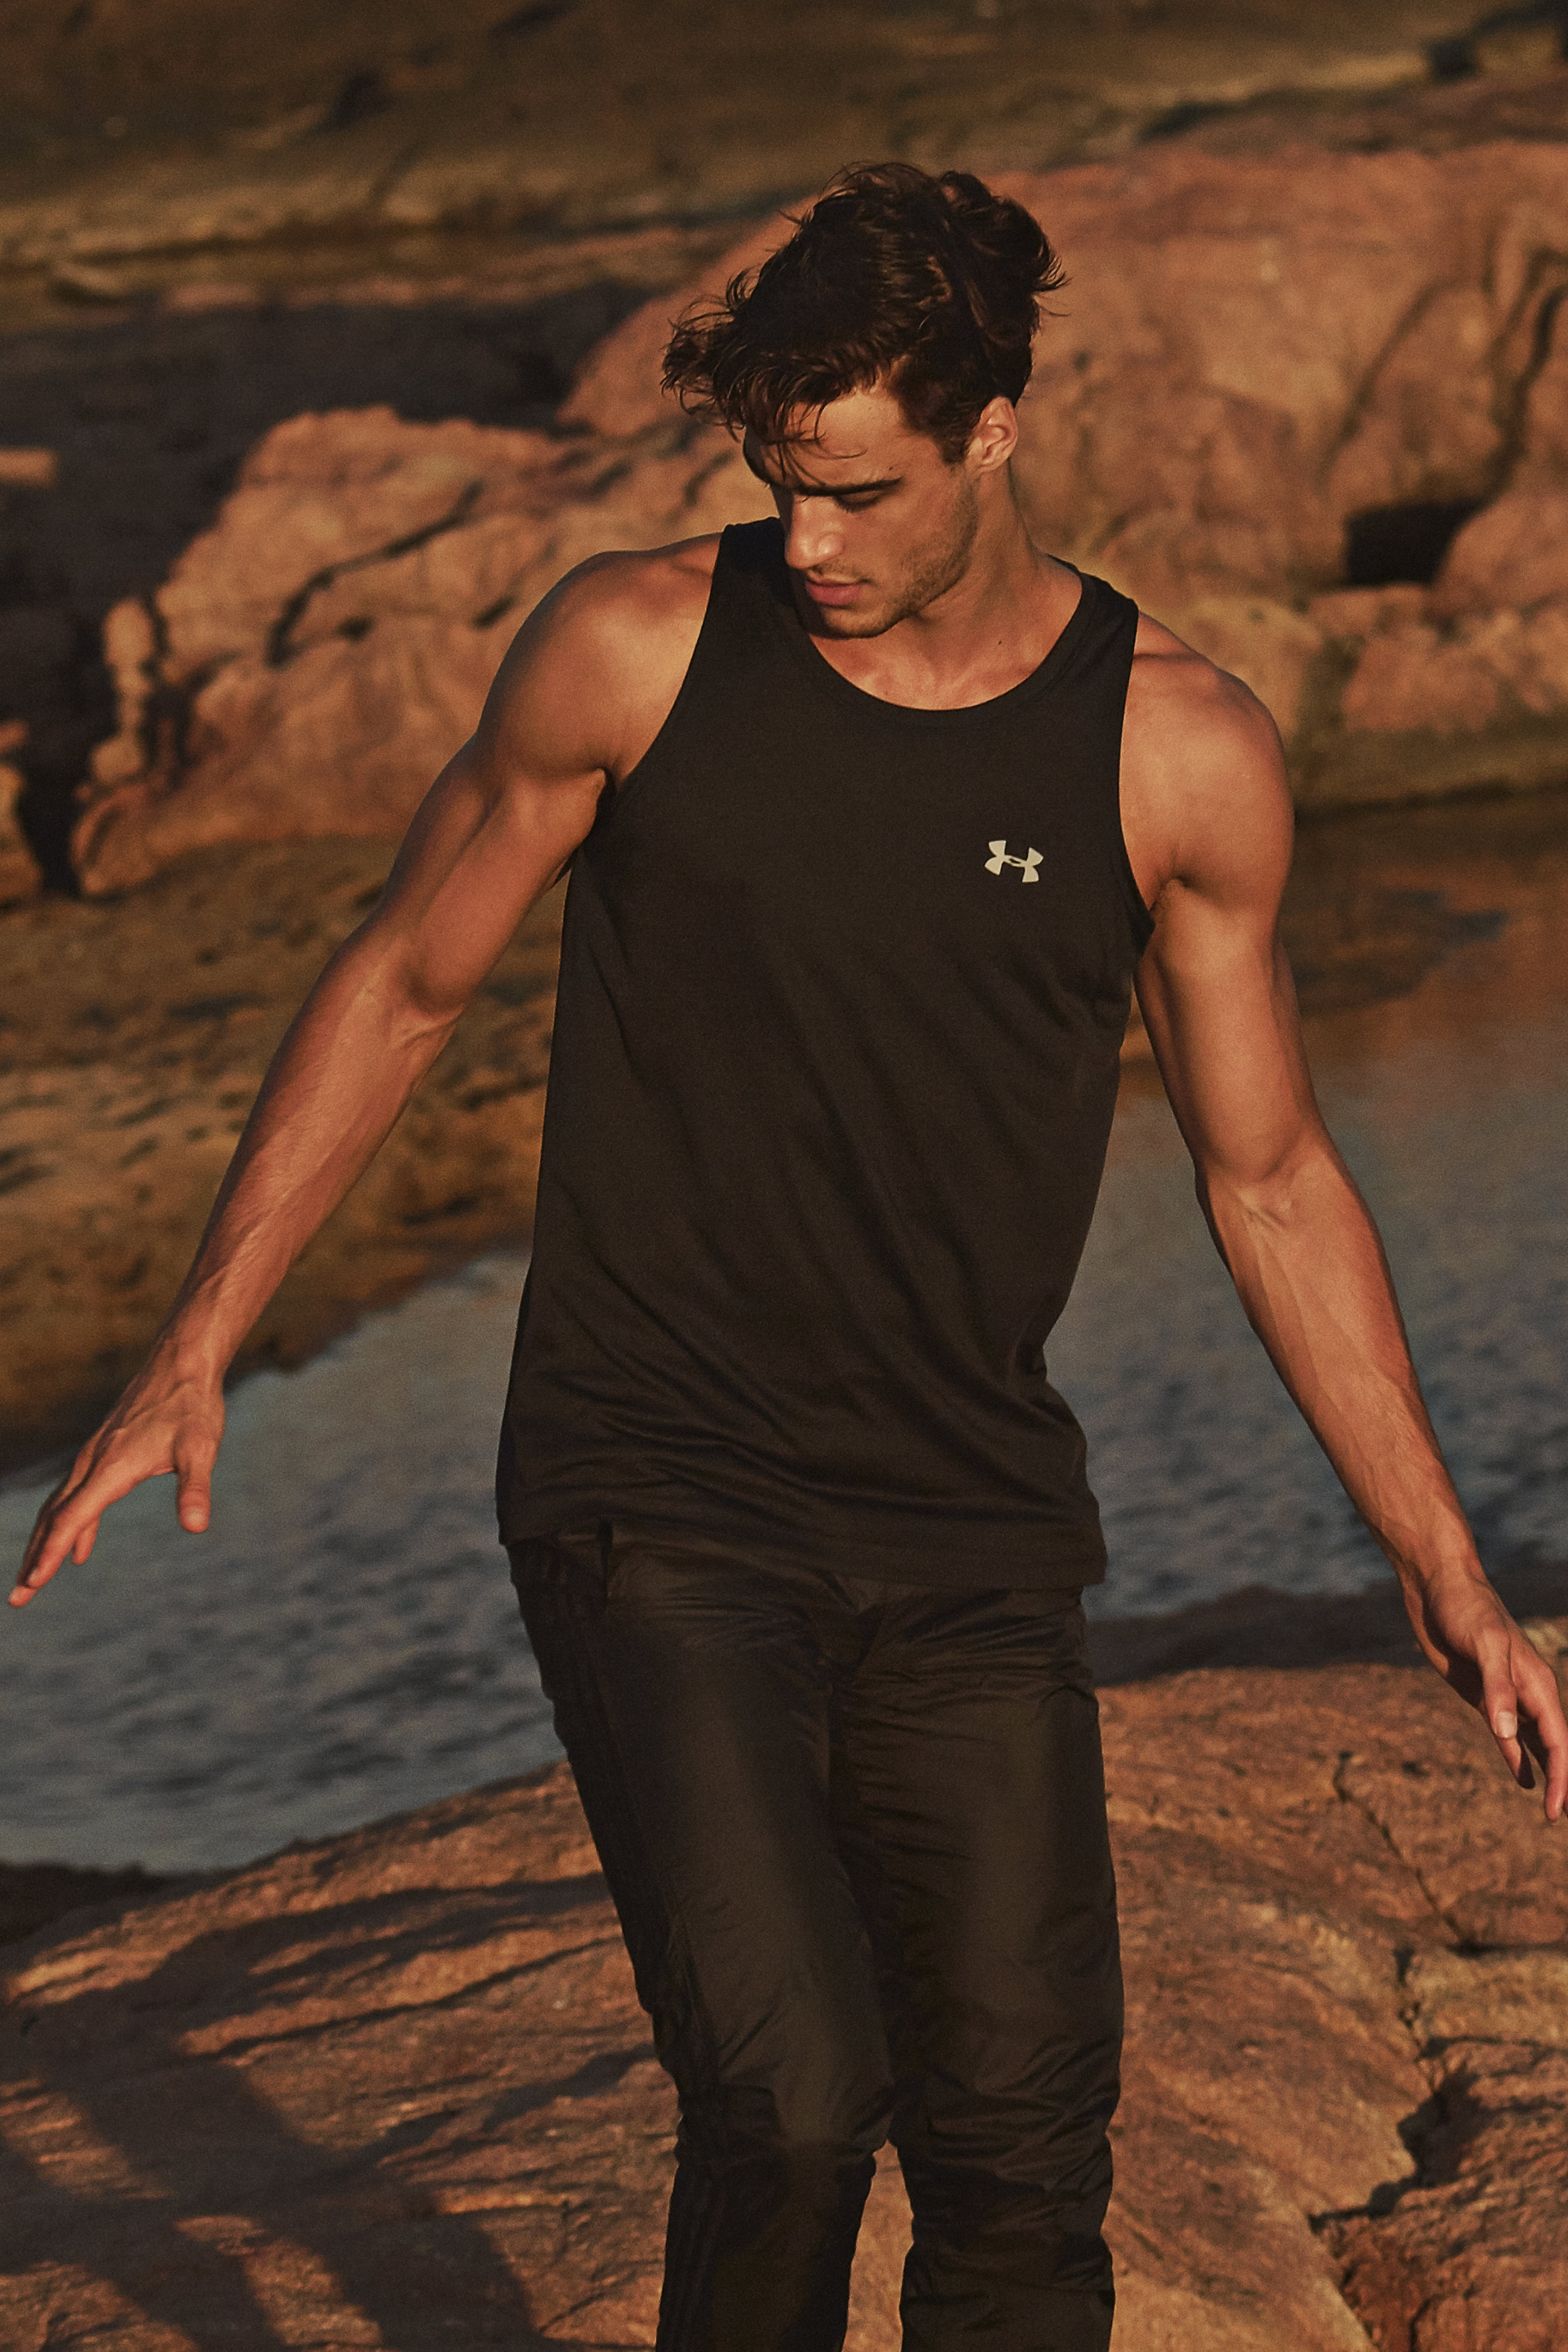 Imanol - photography Lucas Riccistyling Gaston Olmosmodel Imanol @ Montevideo Models#StarkMag